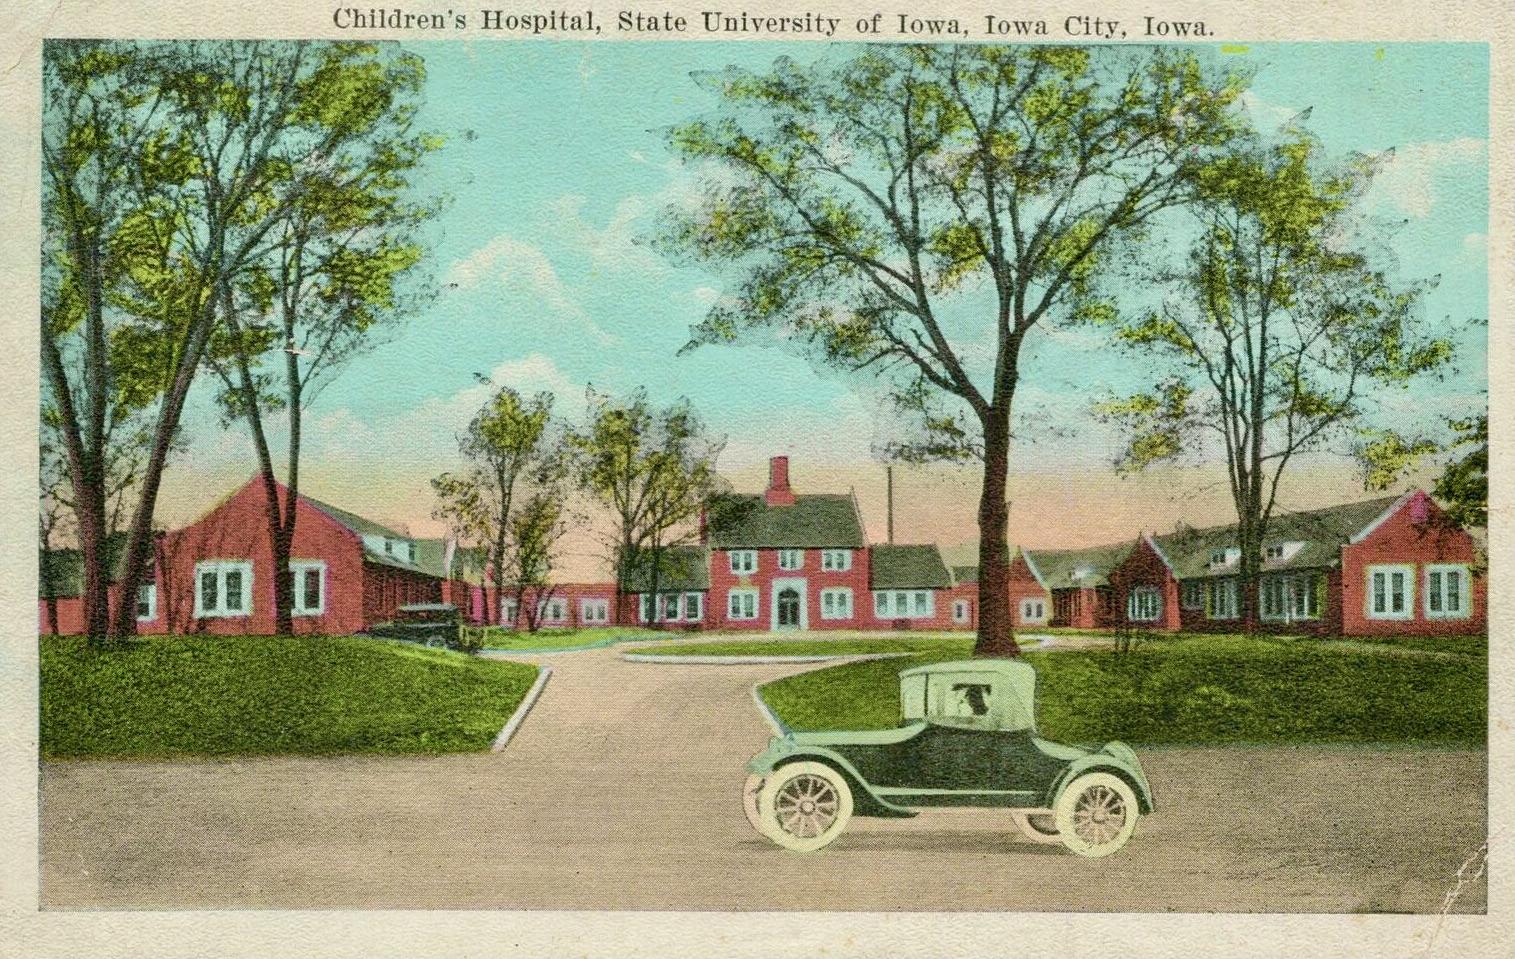 1921ChildHospital 2